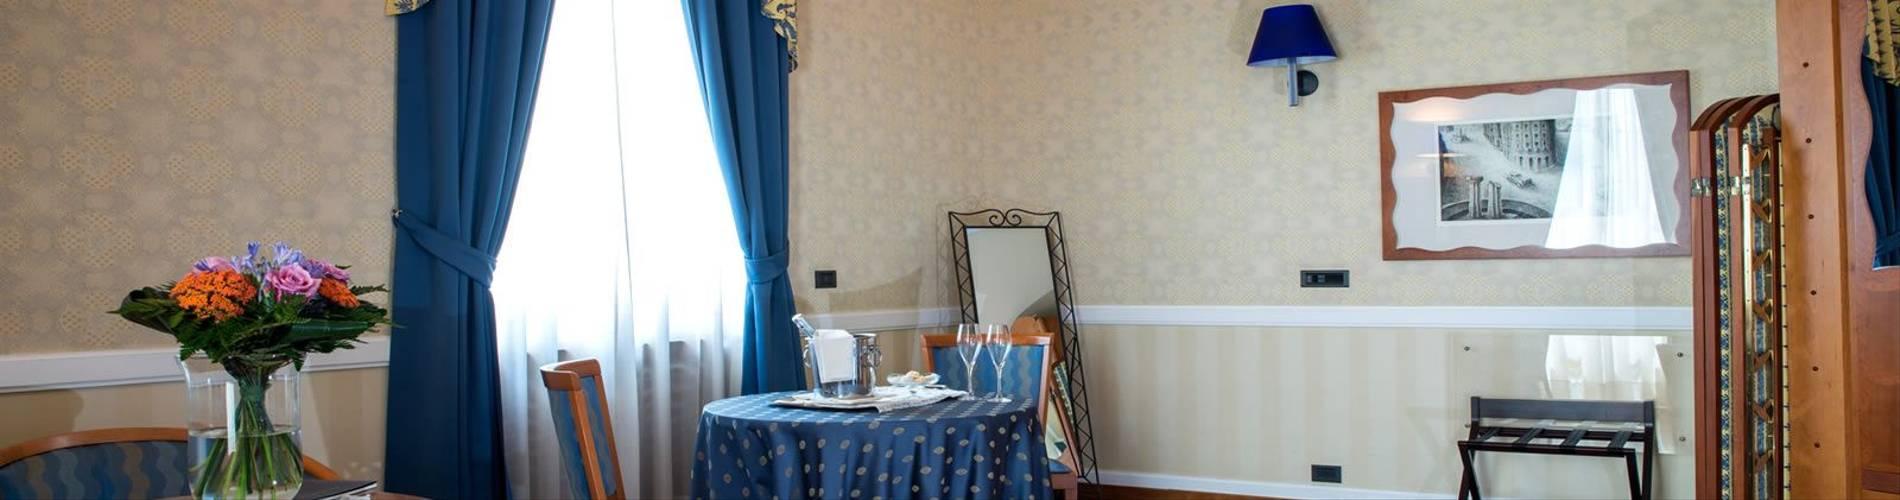 Grand Hotel Ortigia, Sicily, Italy, Artusa Suite (3).jpg